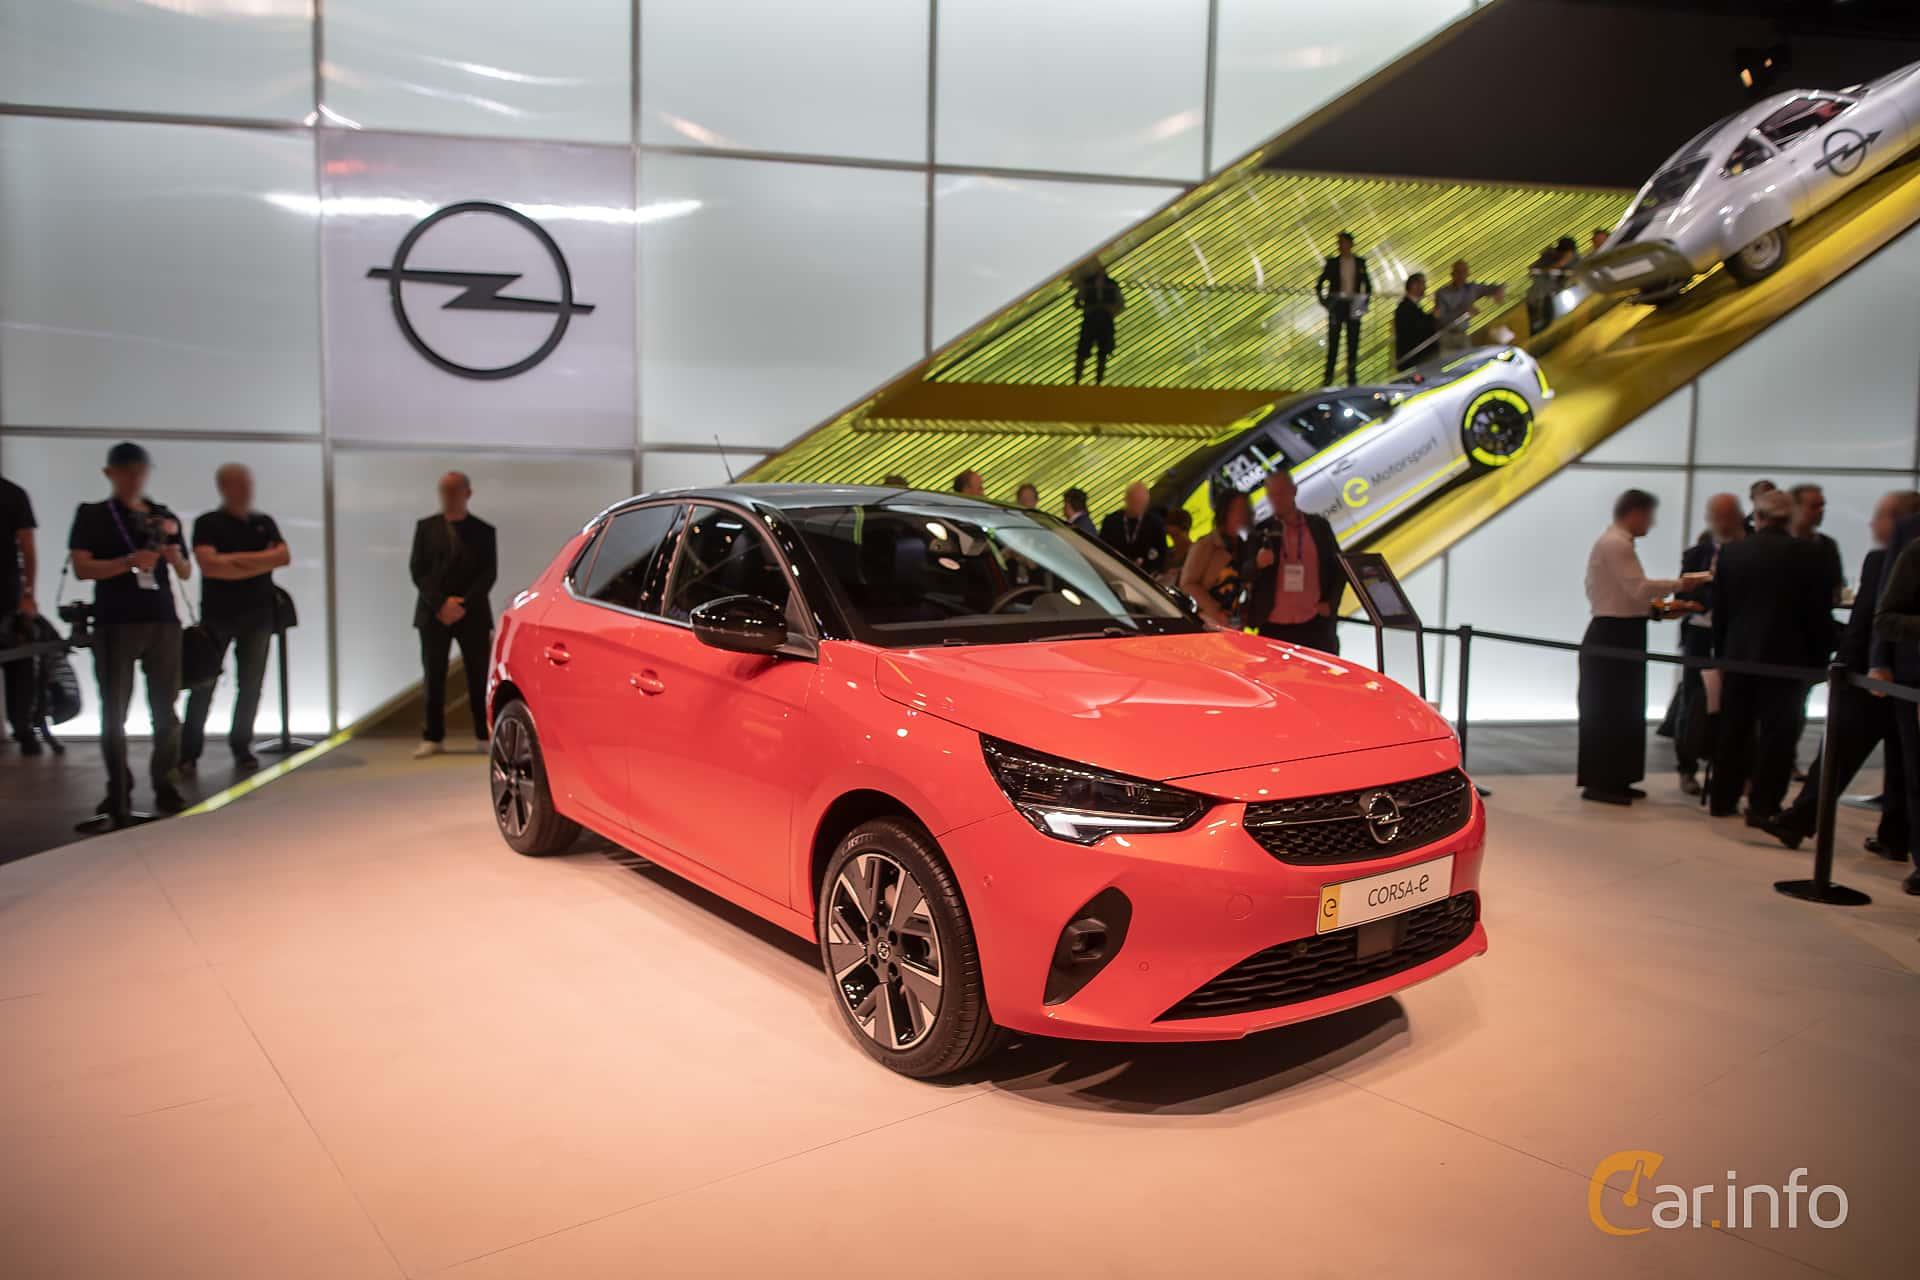 Opel Corsa-e 50 kWh Single Speed, 136hp, 2020 at IAA 2019